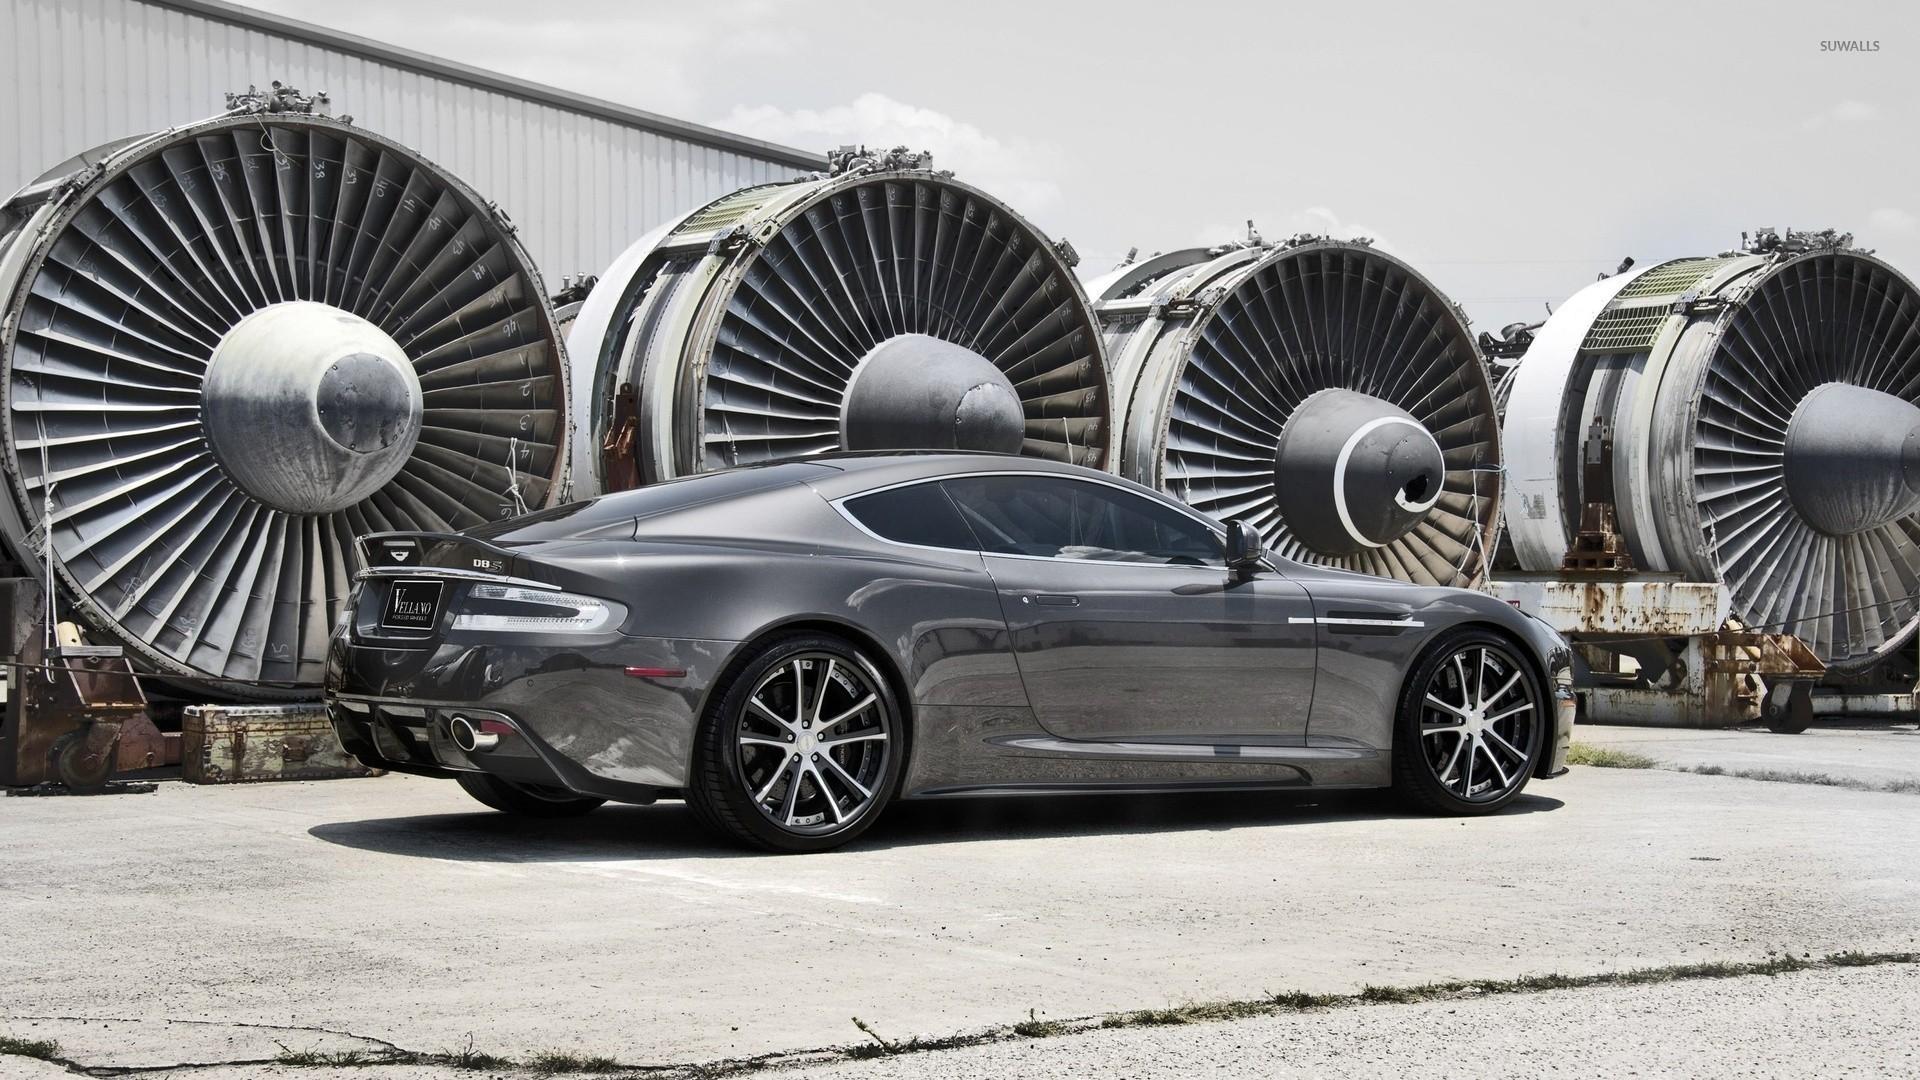 Veliano Aston Martin Dbs Wallpaper Car Wallpapers 43230